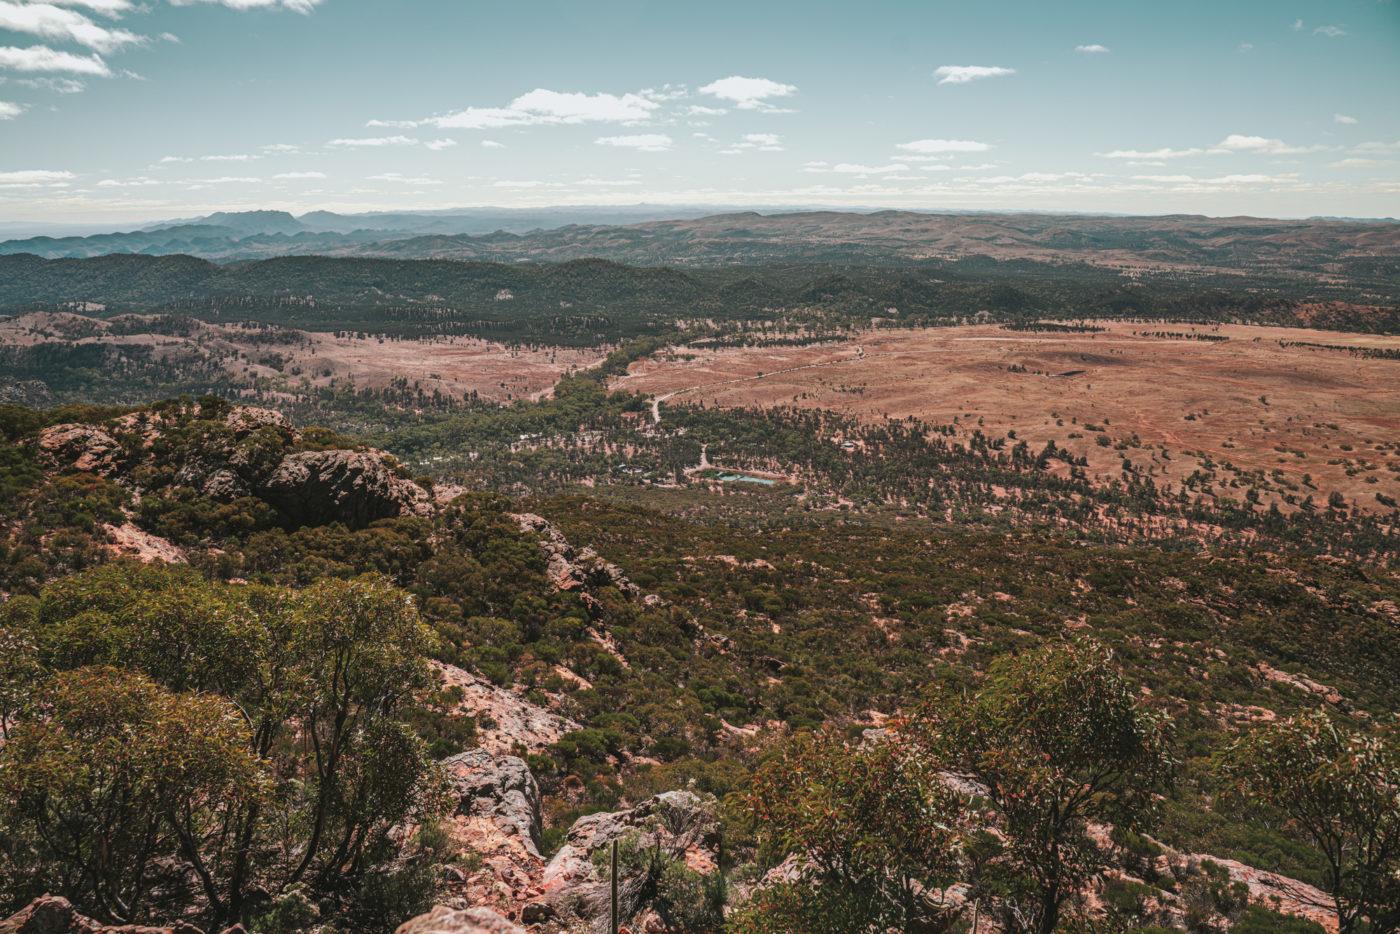 View from the top of Mt Ohlssen Bagge, Flinders Range National Park